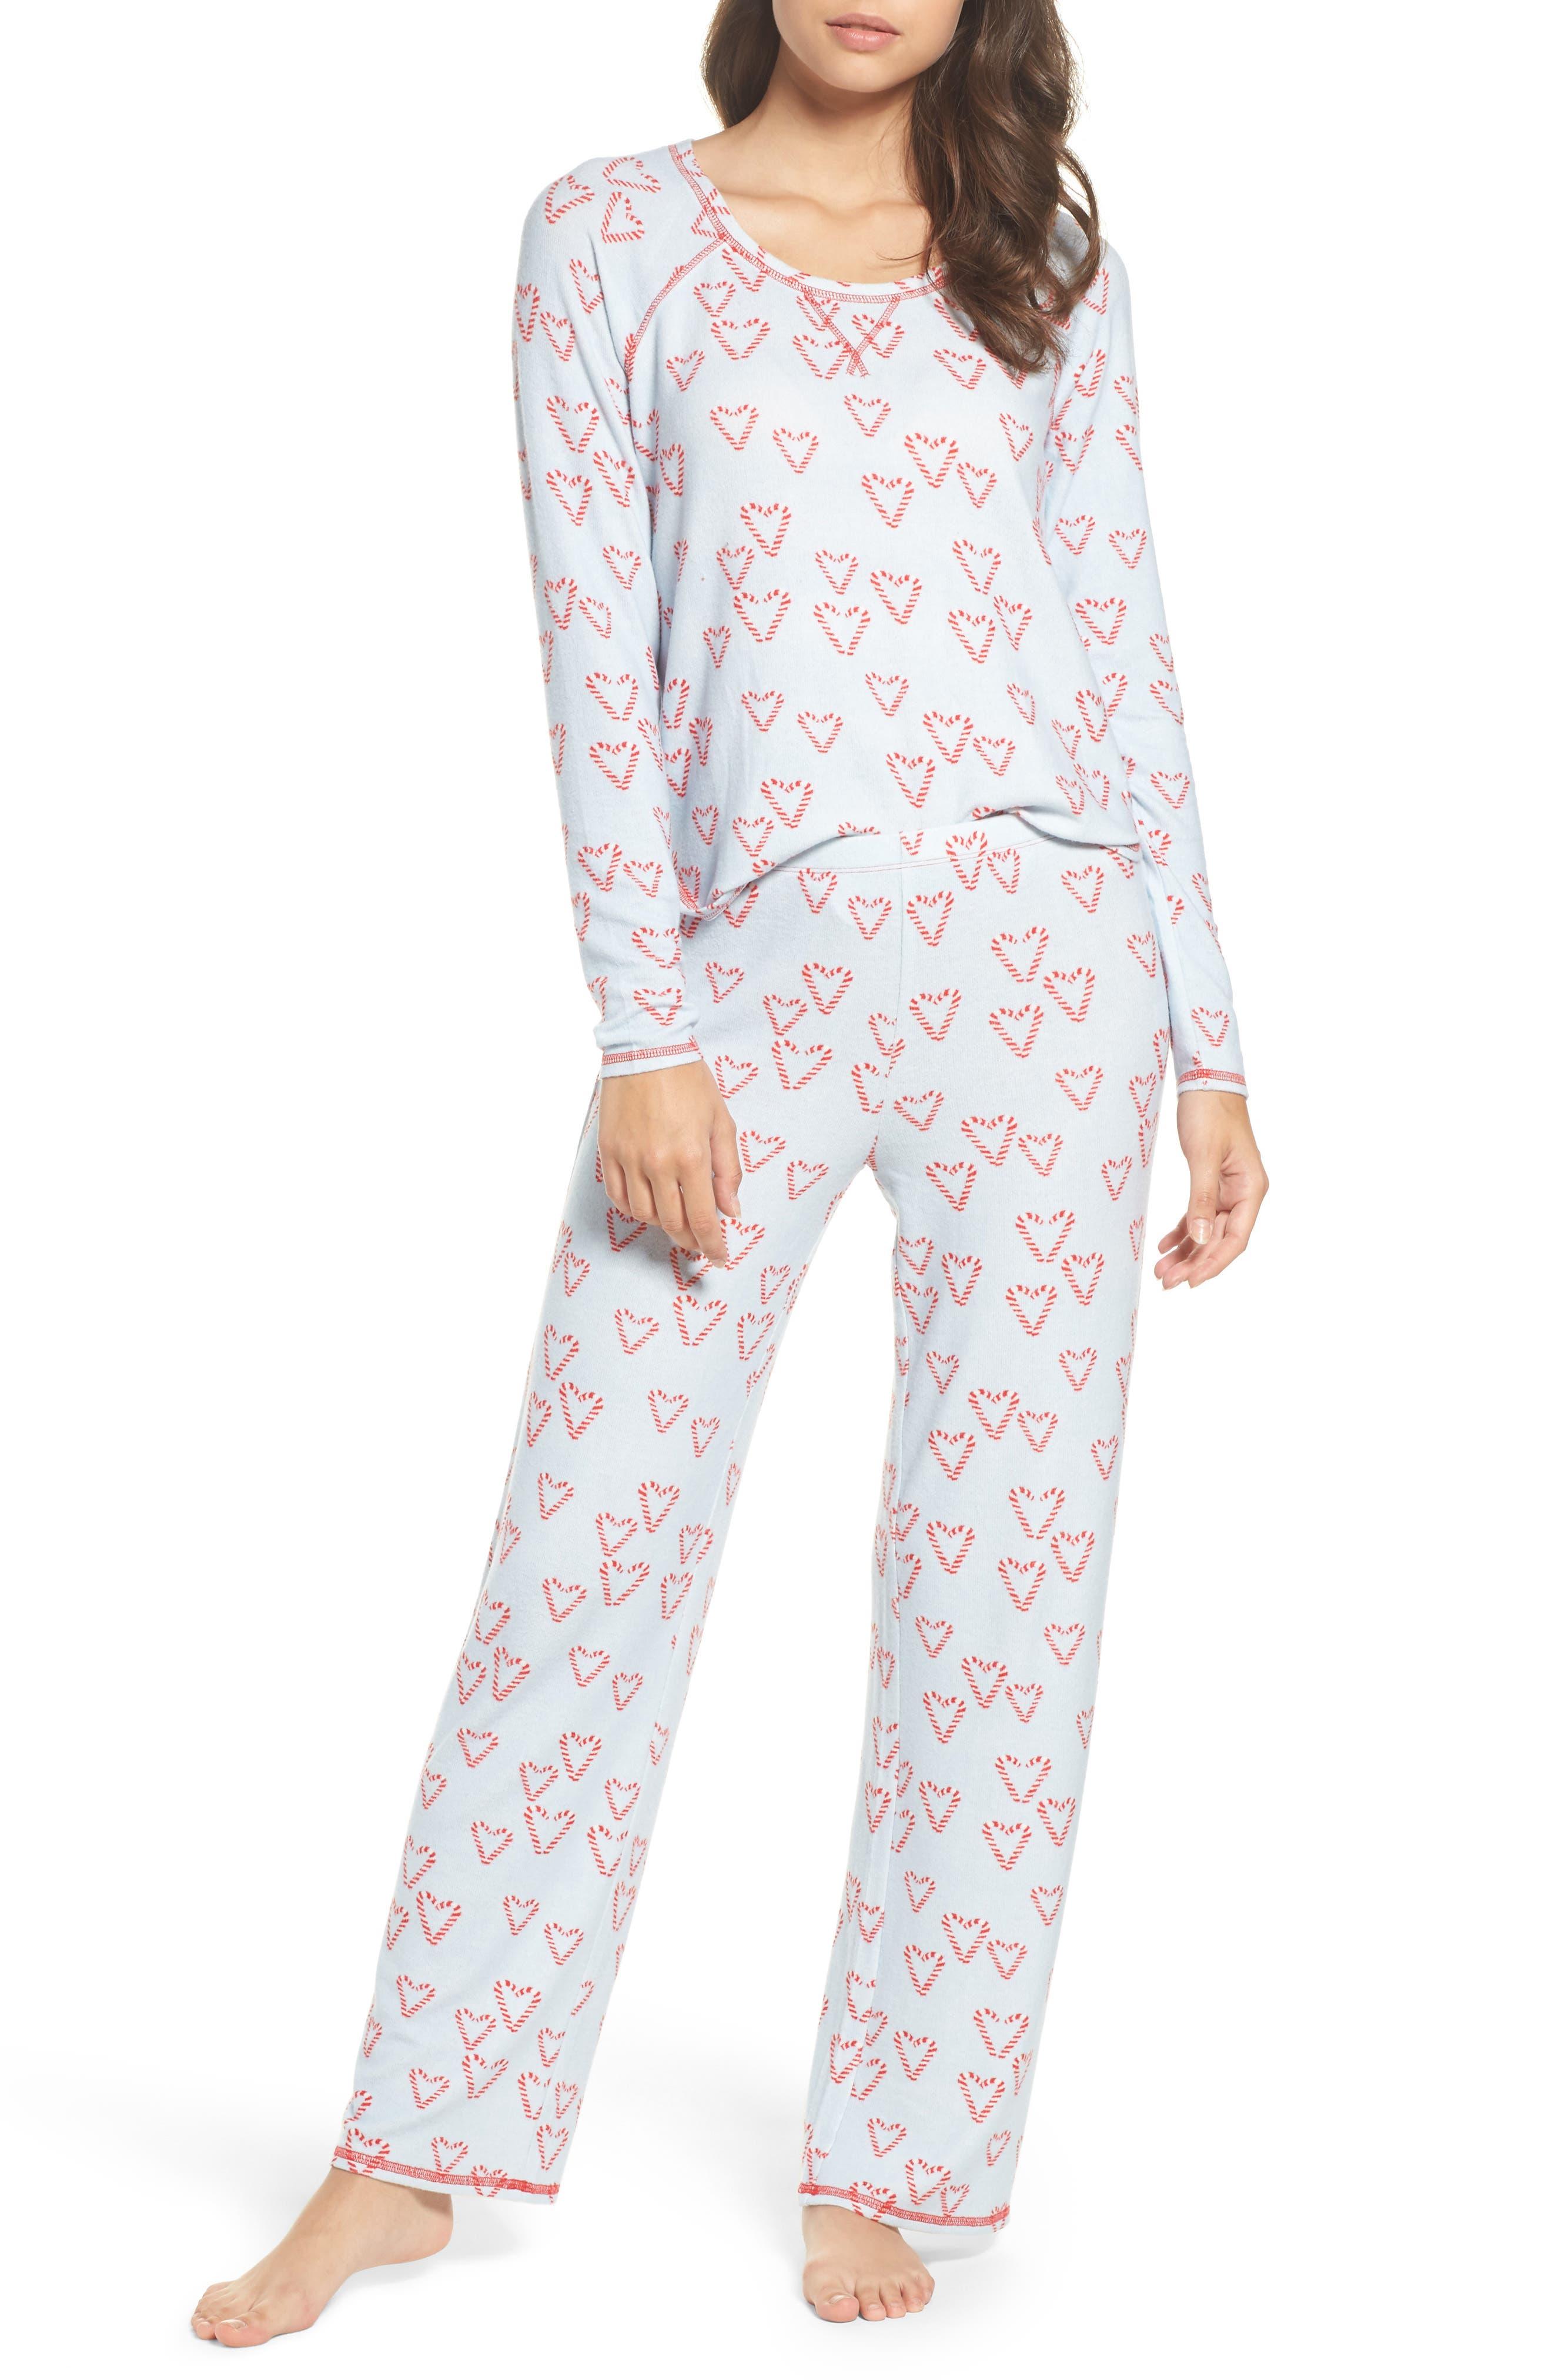 Main Image - Make + Model Knit Girlfriend Pajamas & Eye Mask